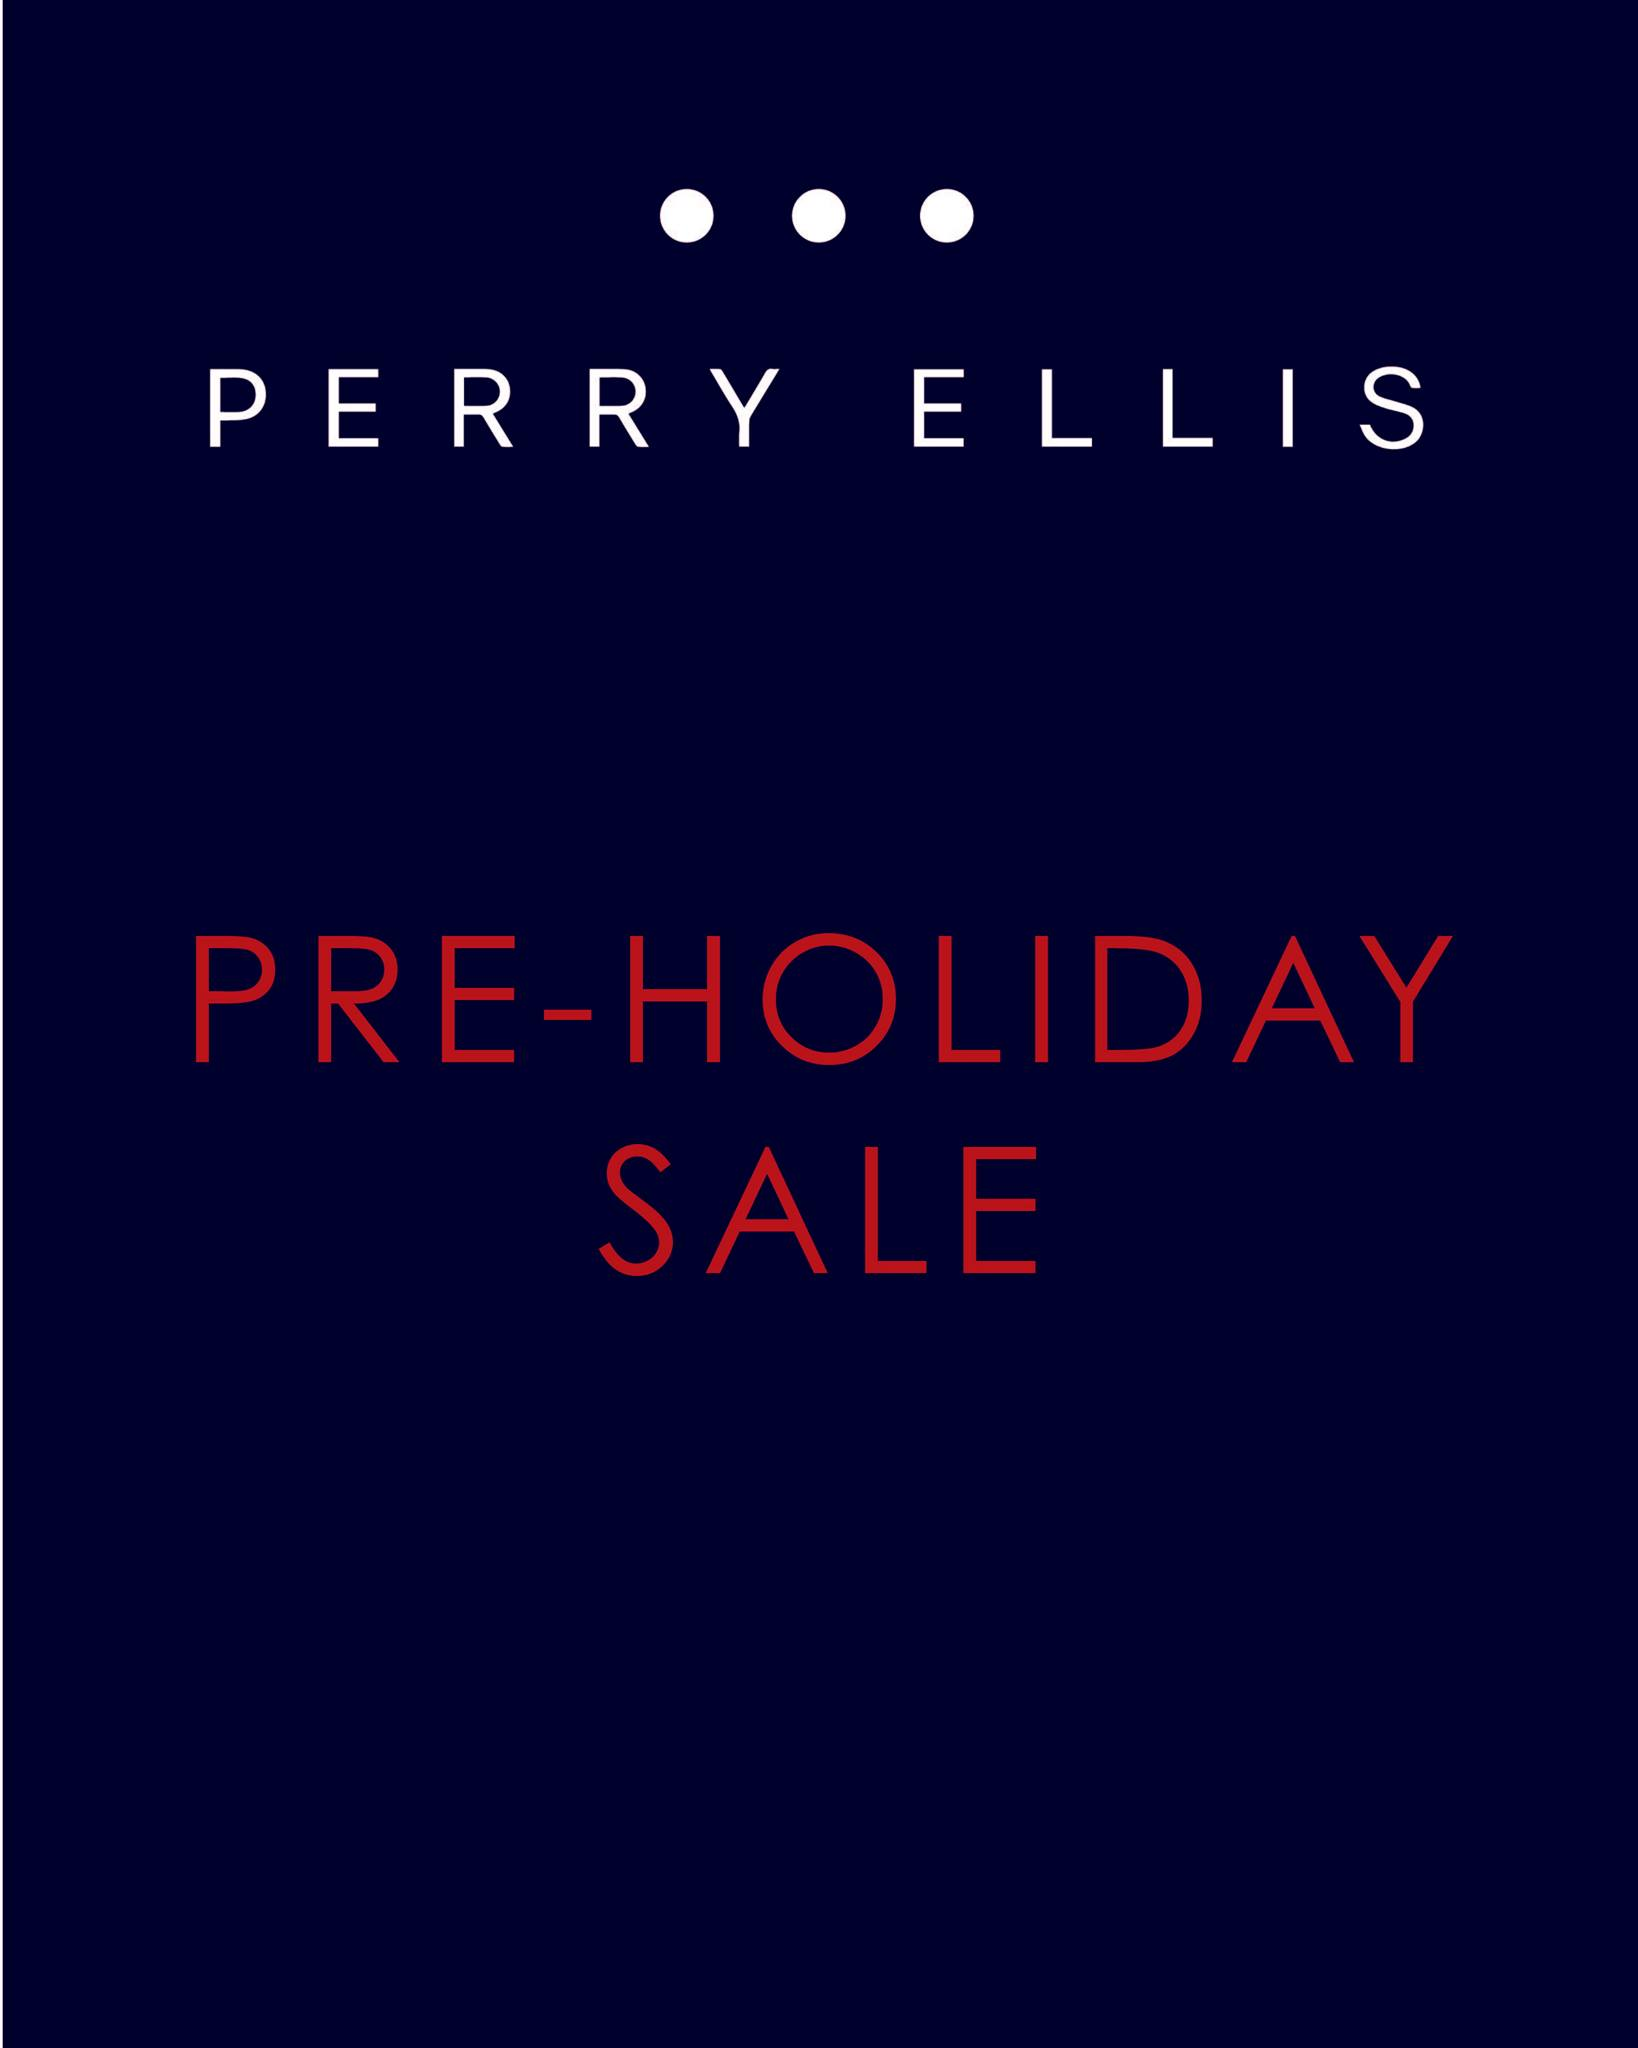 Perry Ellis Pre-Holiday Sale October 2013